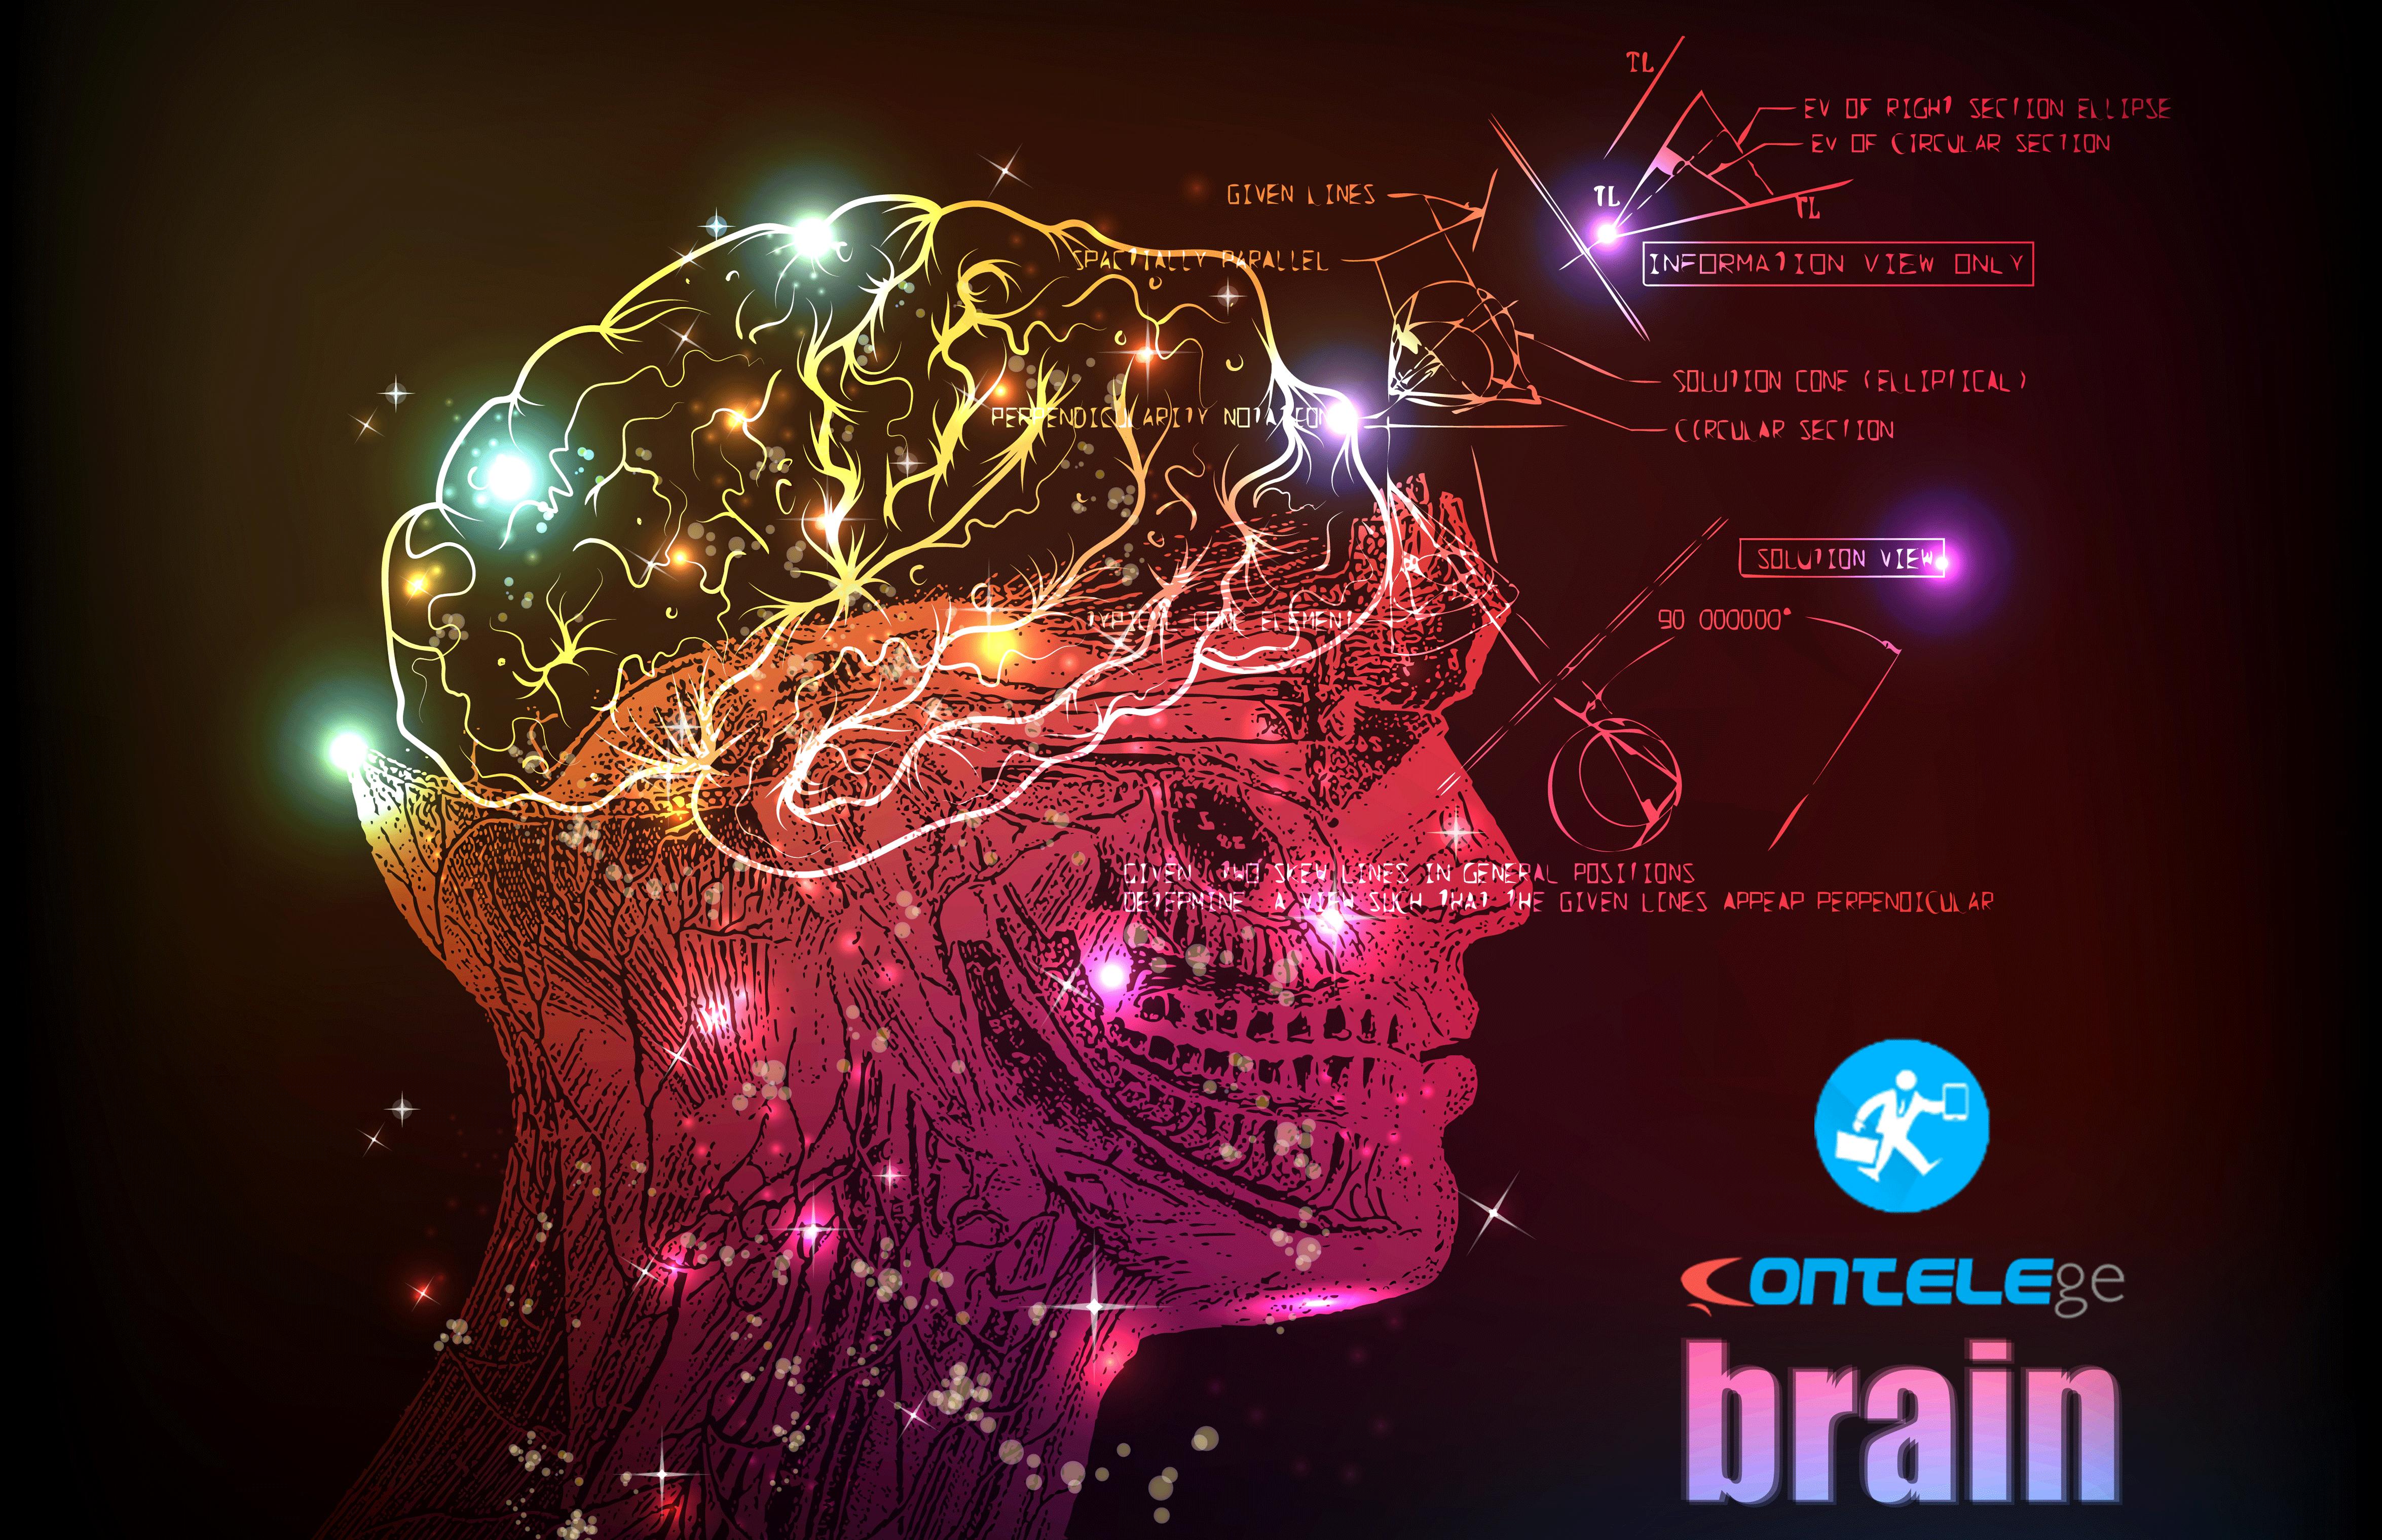 Contele GE 2.1.3 - Versão Brain